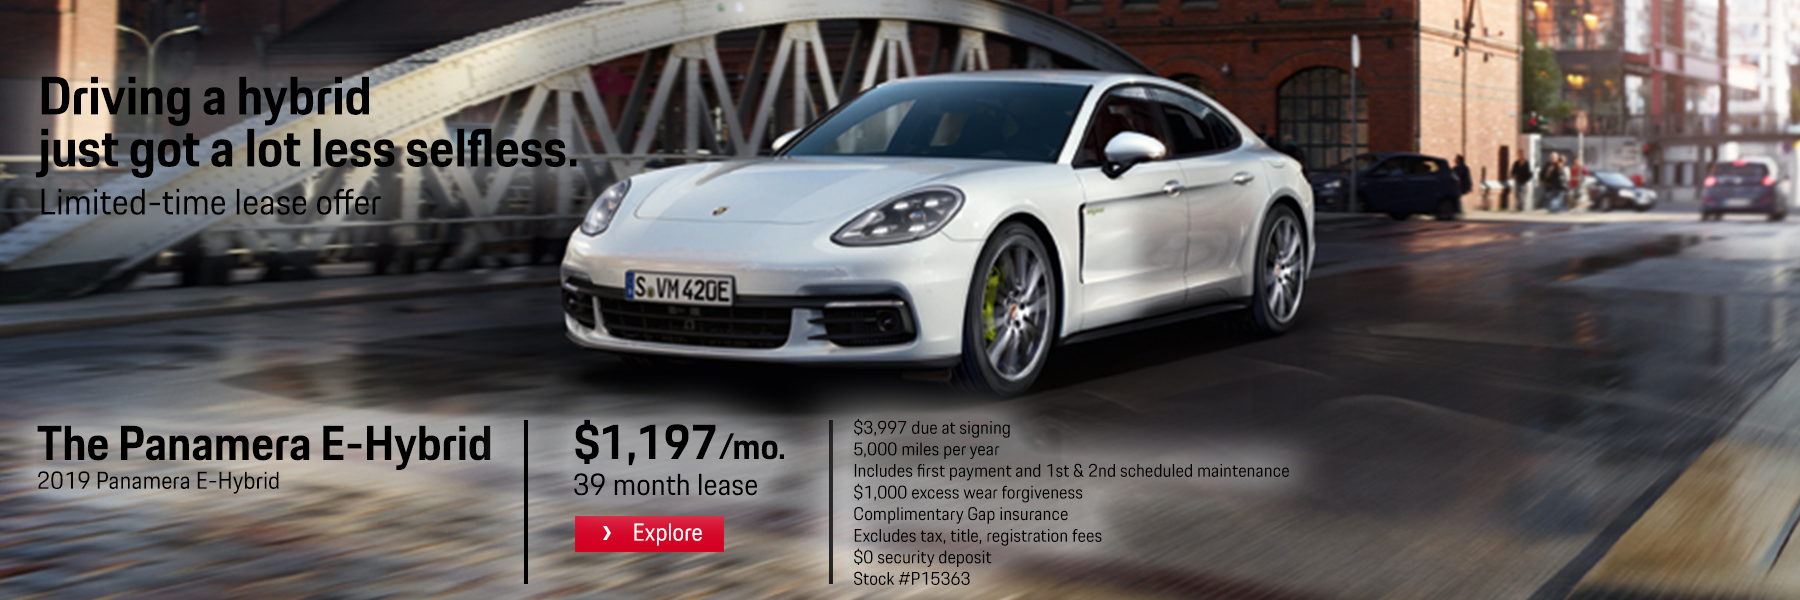 Porsche Atlanta Perimeter | Porsche Dealer in Atlanta, GA